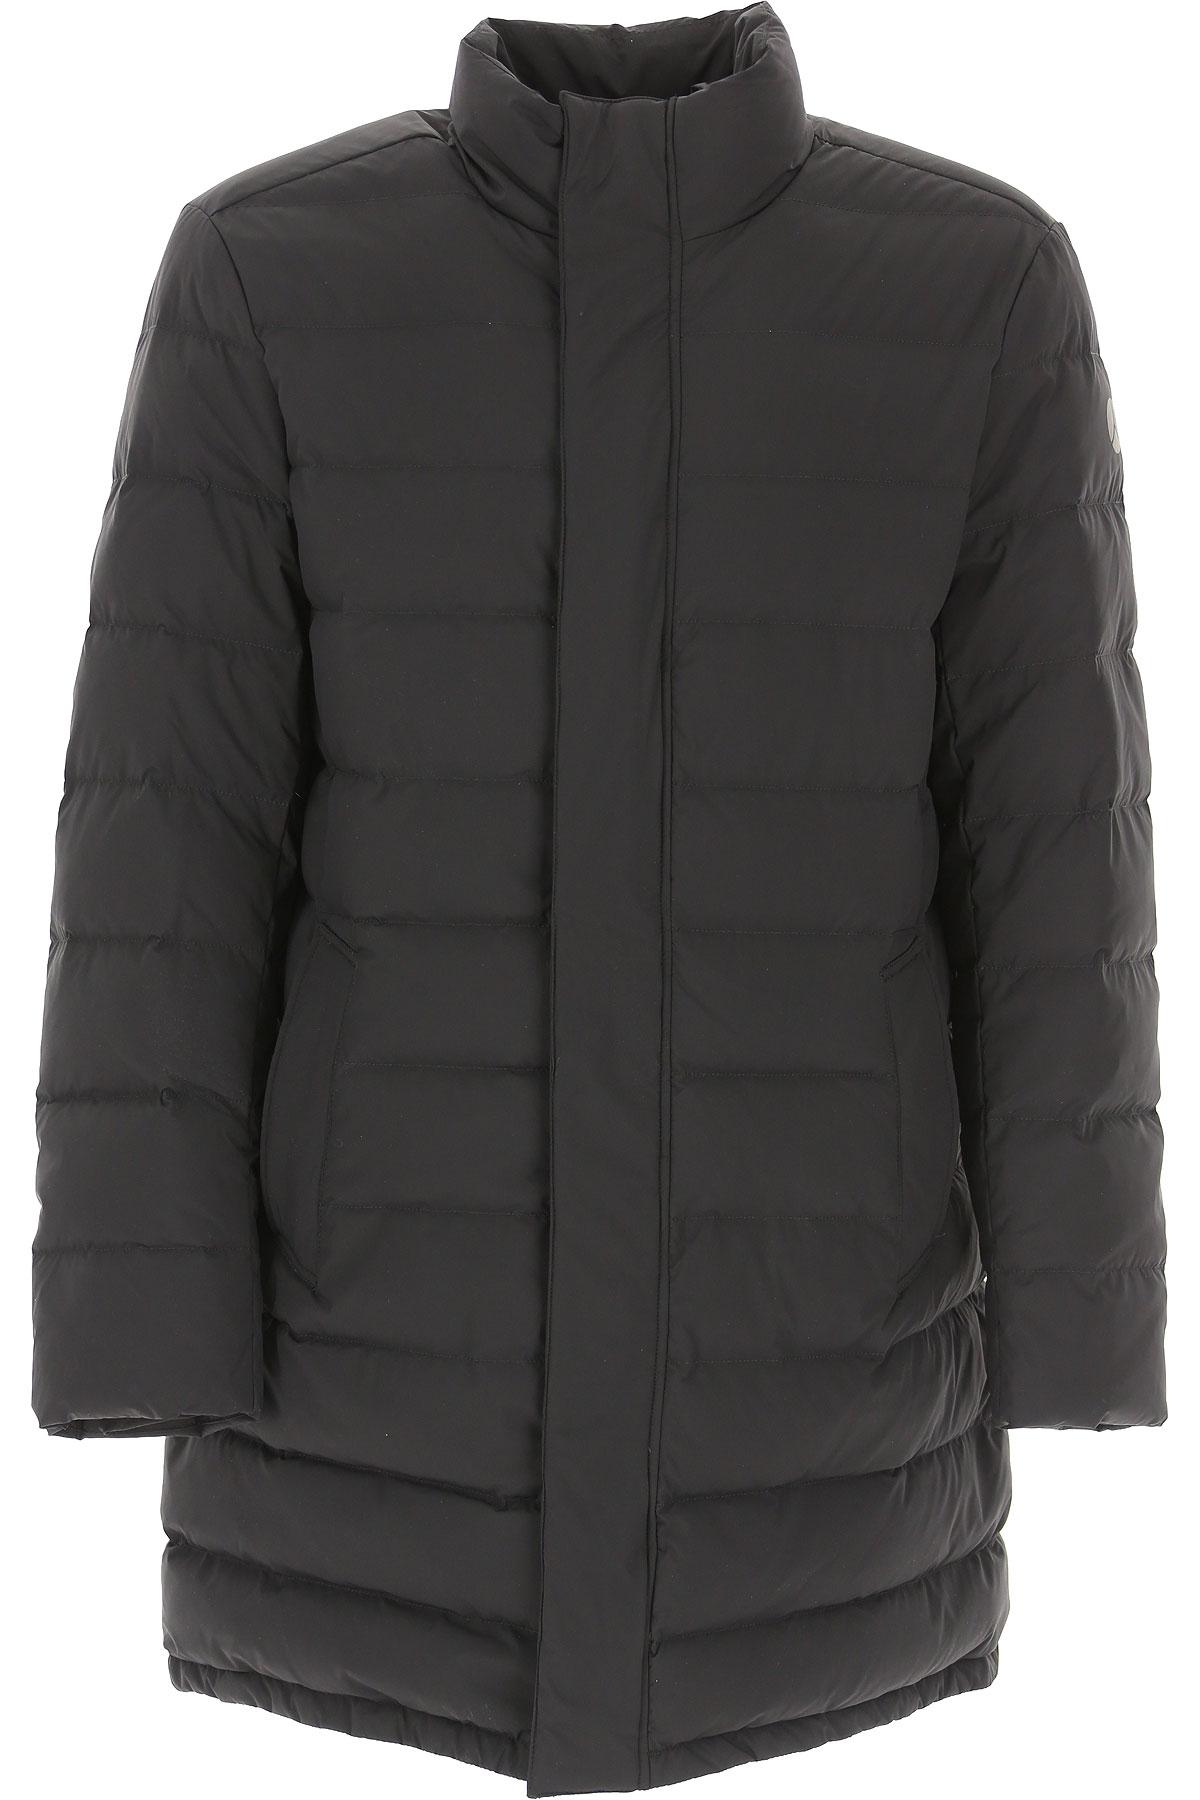 People of Shibuya Down Jacket for Men, Puffer Ski Jacket On Sale, Black, polyester, 2019, L XL